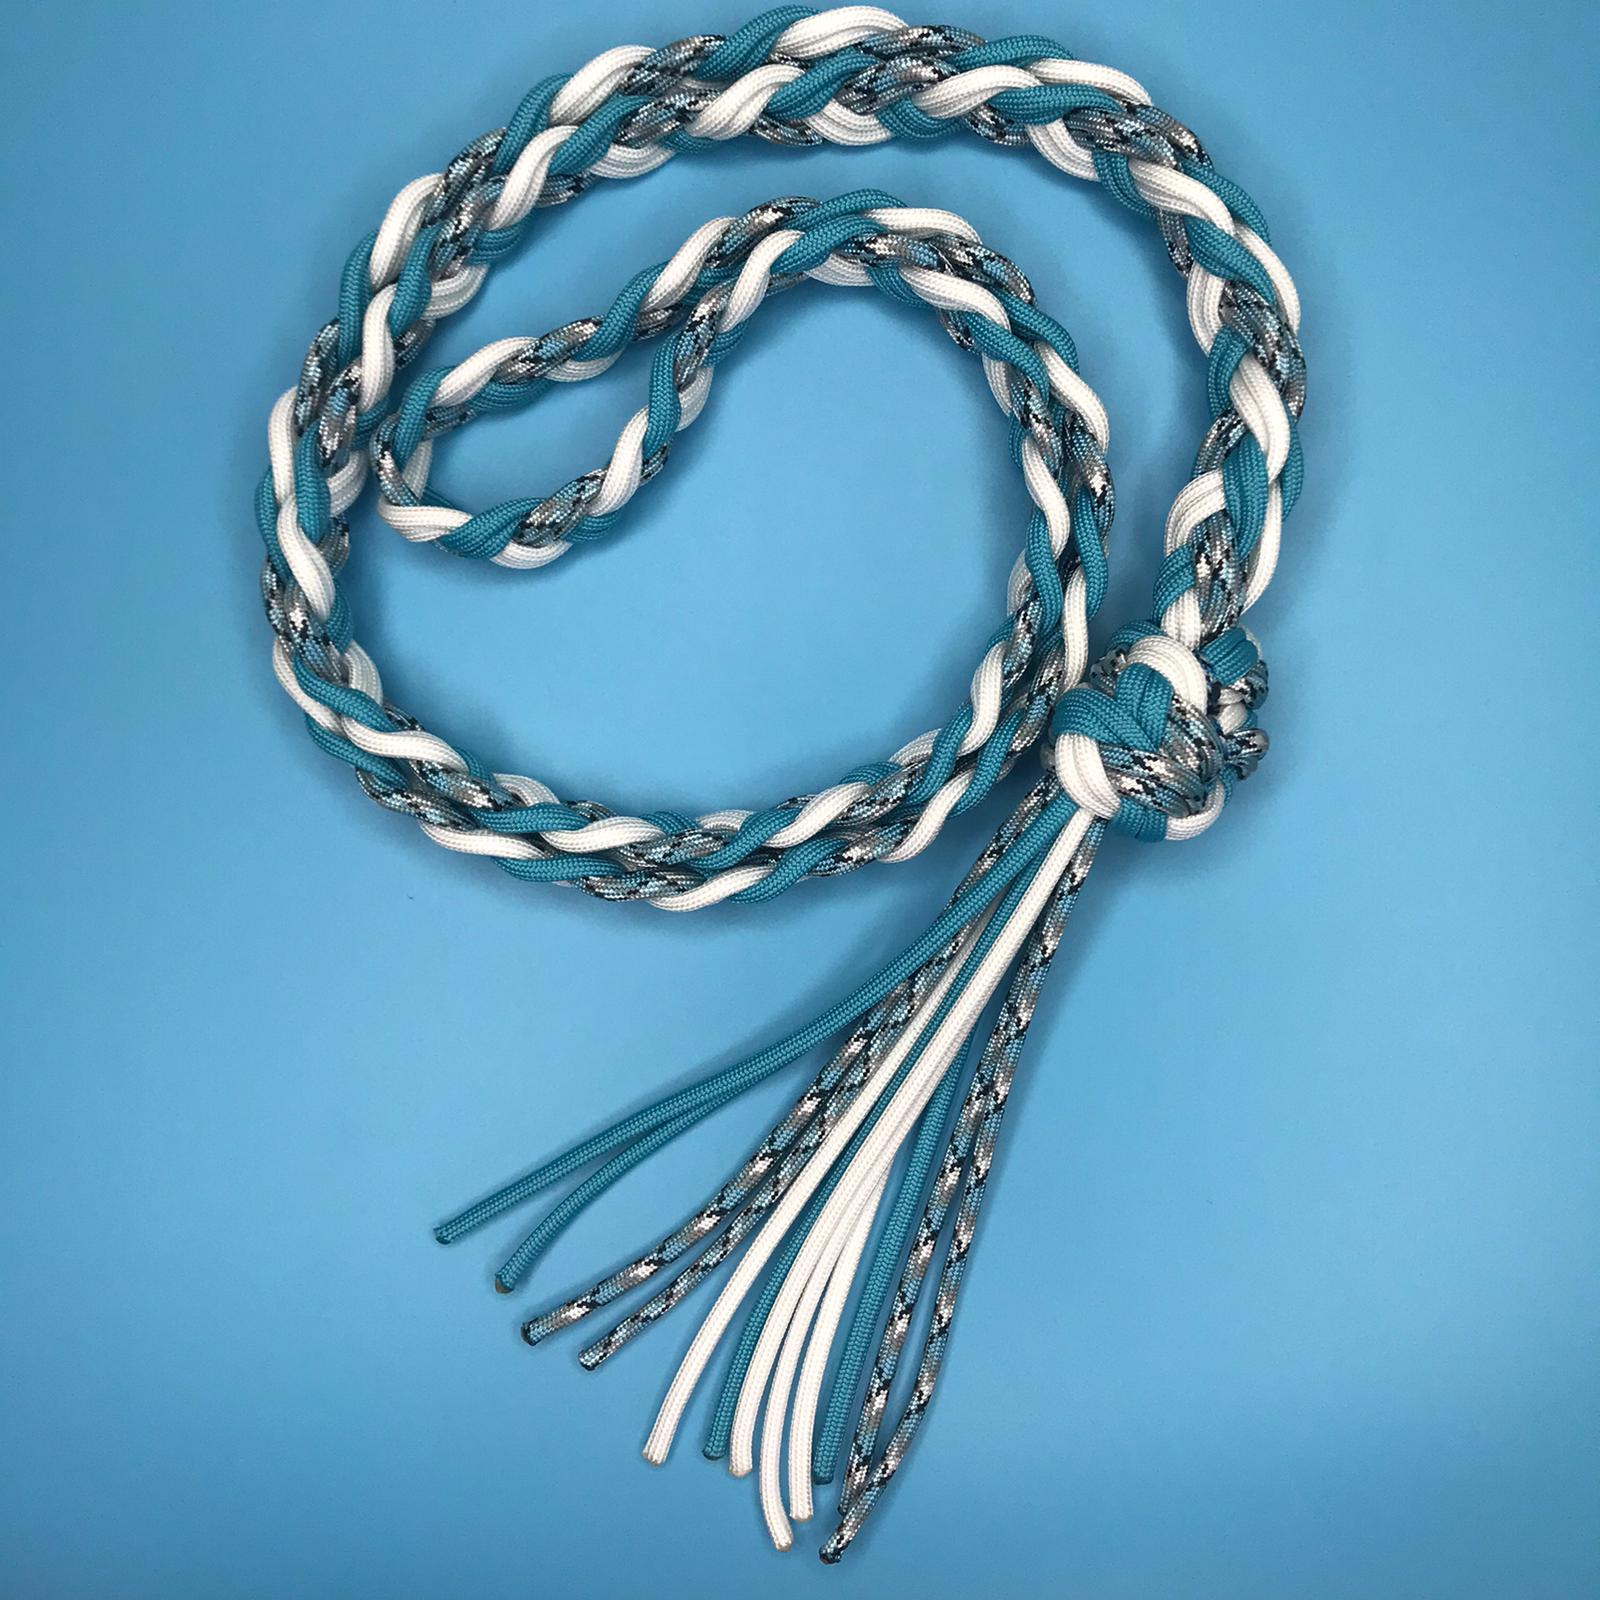 Pale Blue & White Neck Strap